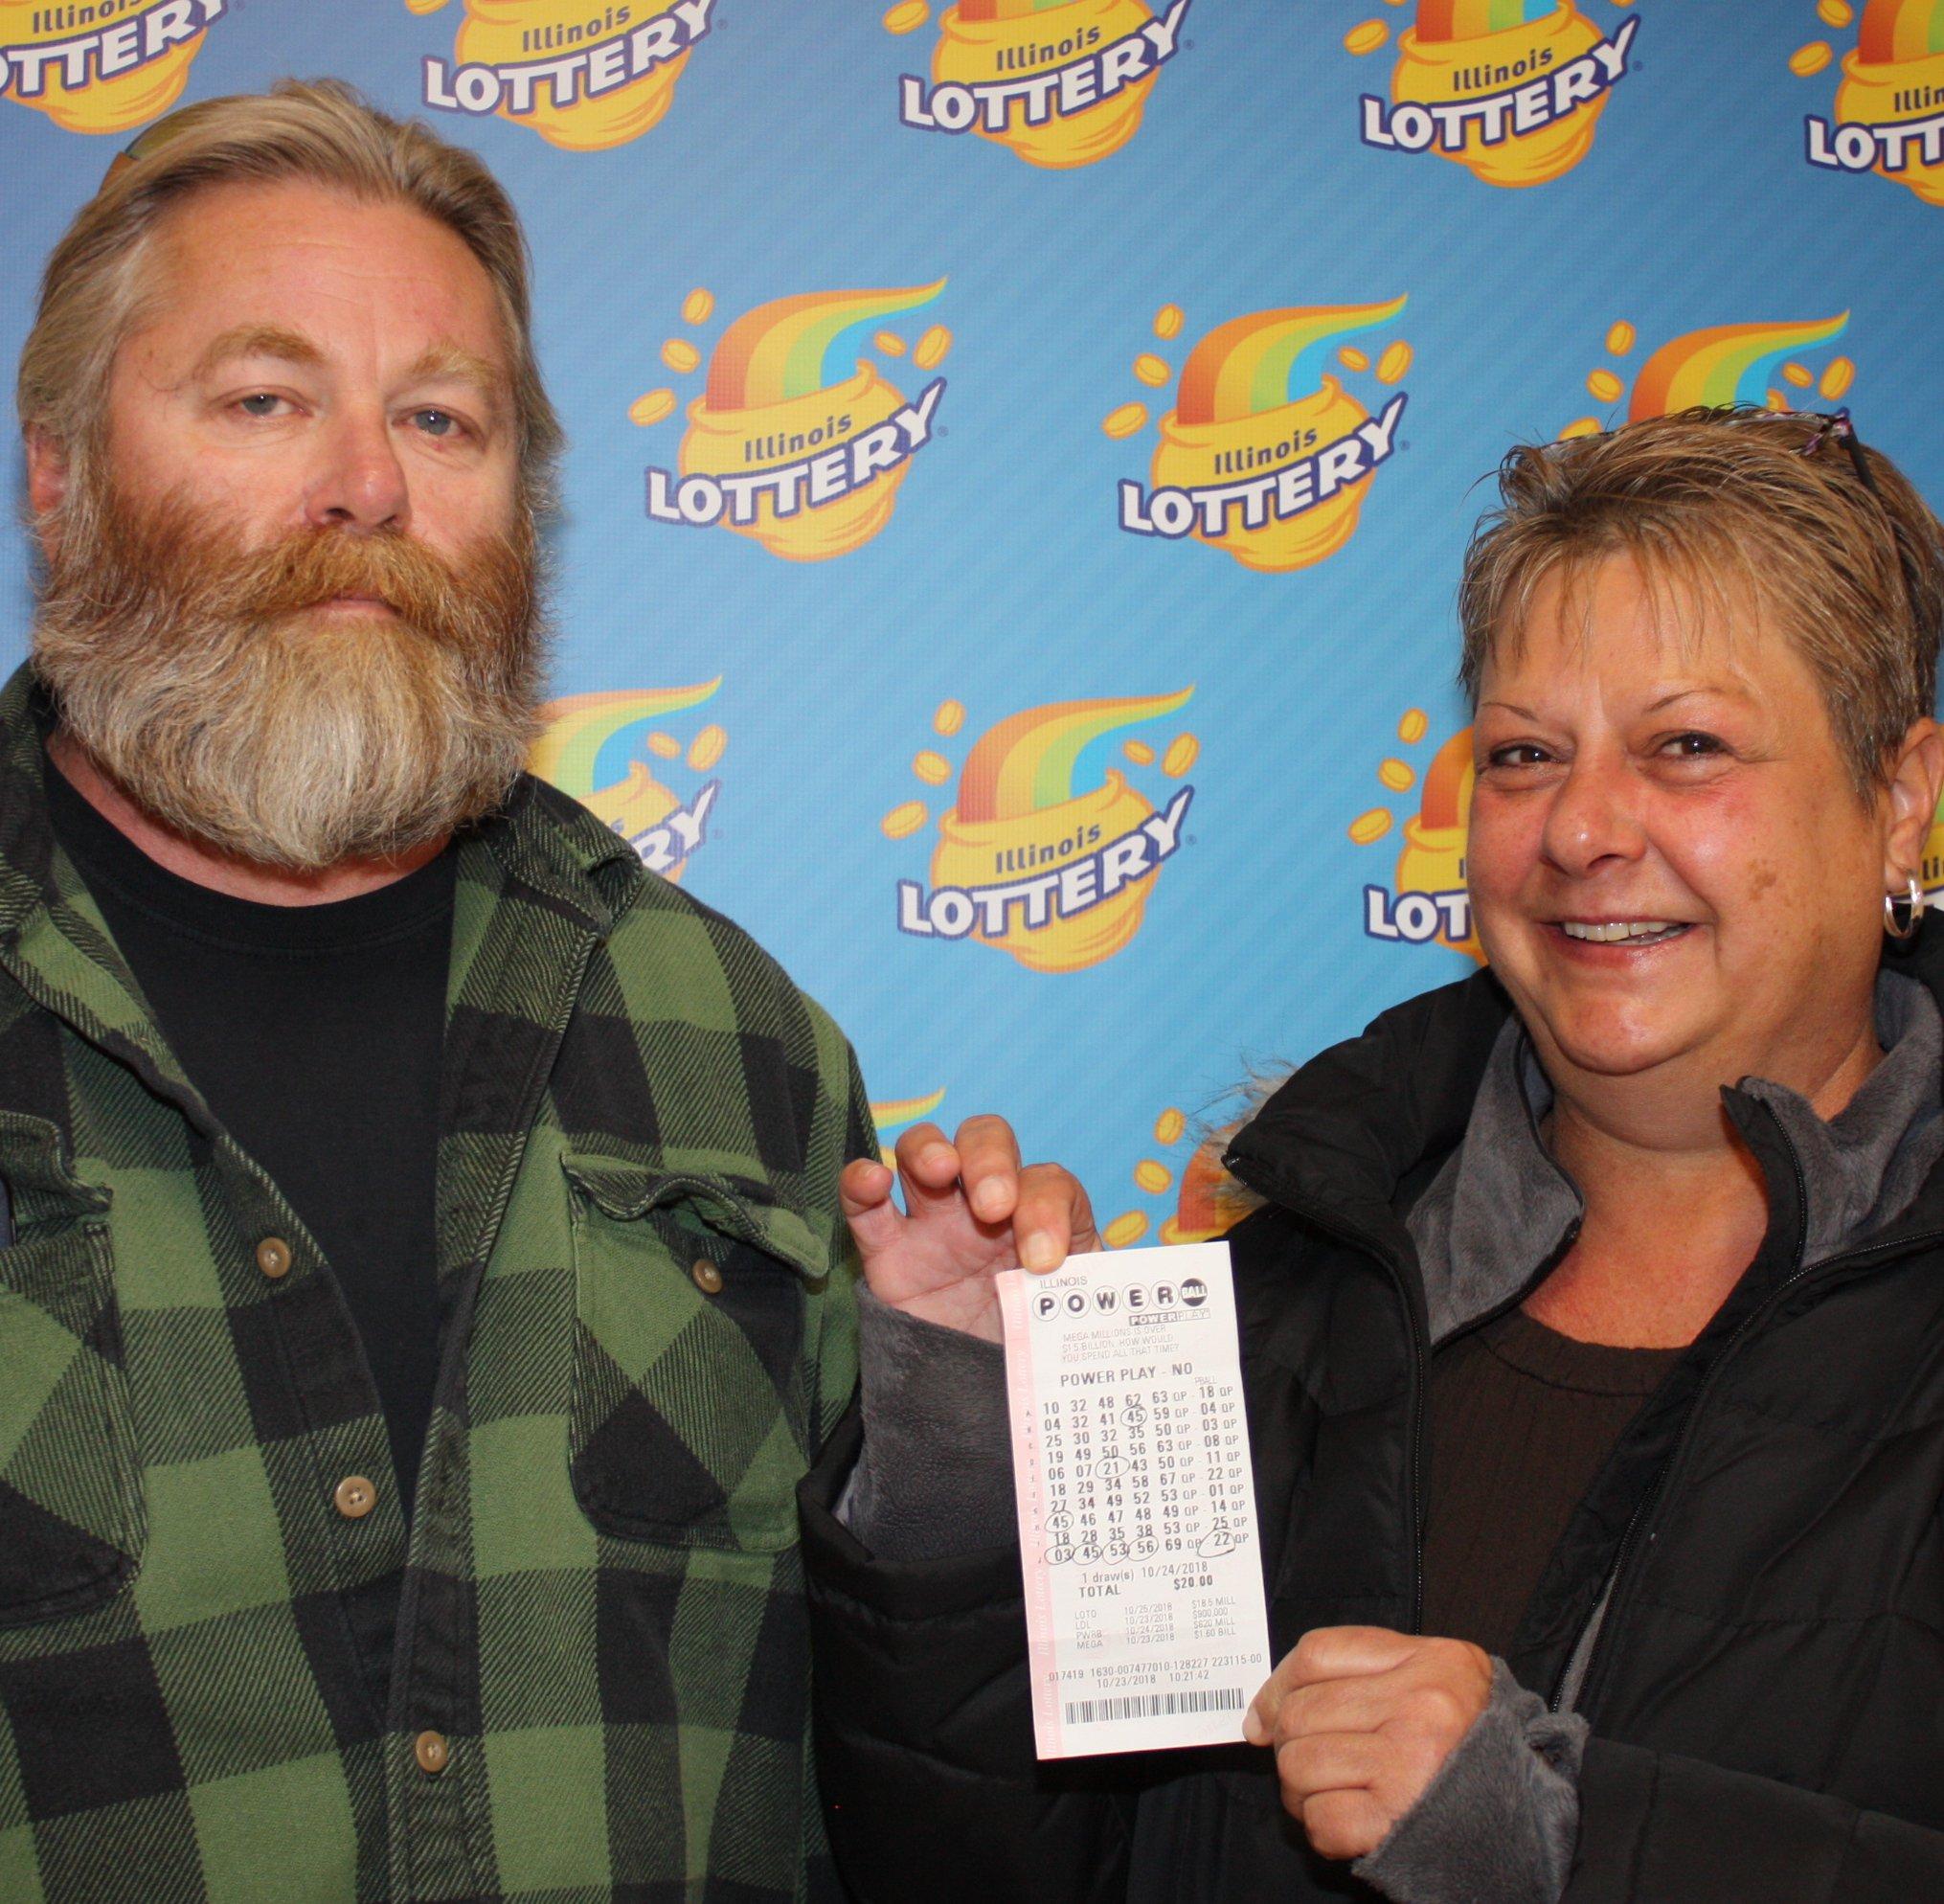 Illinois Lottery On Twitter Congrats To David M Of Geneva Who